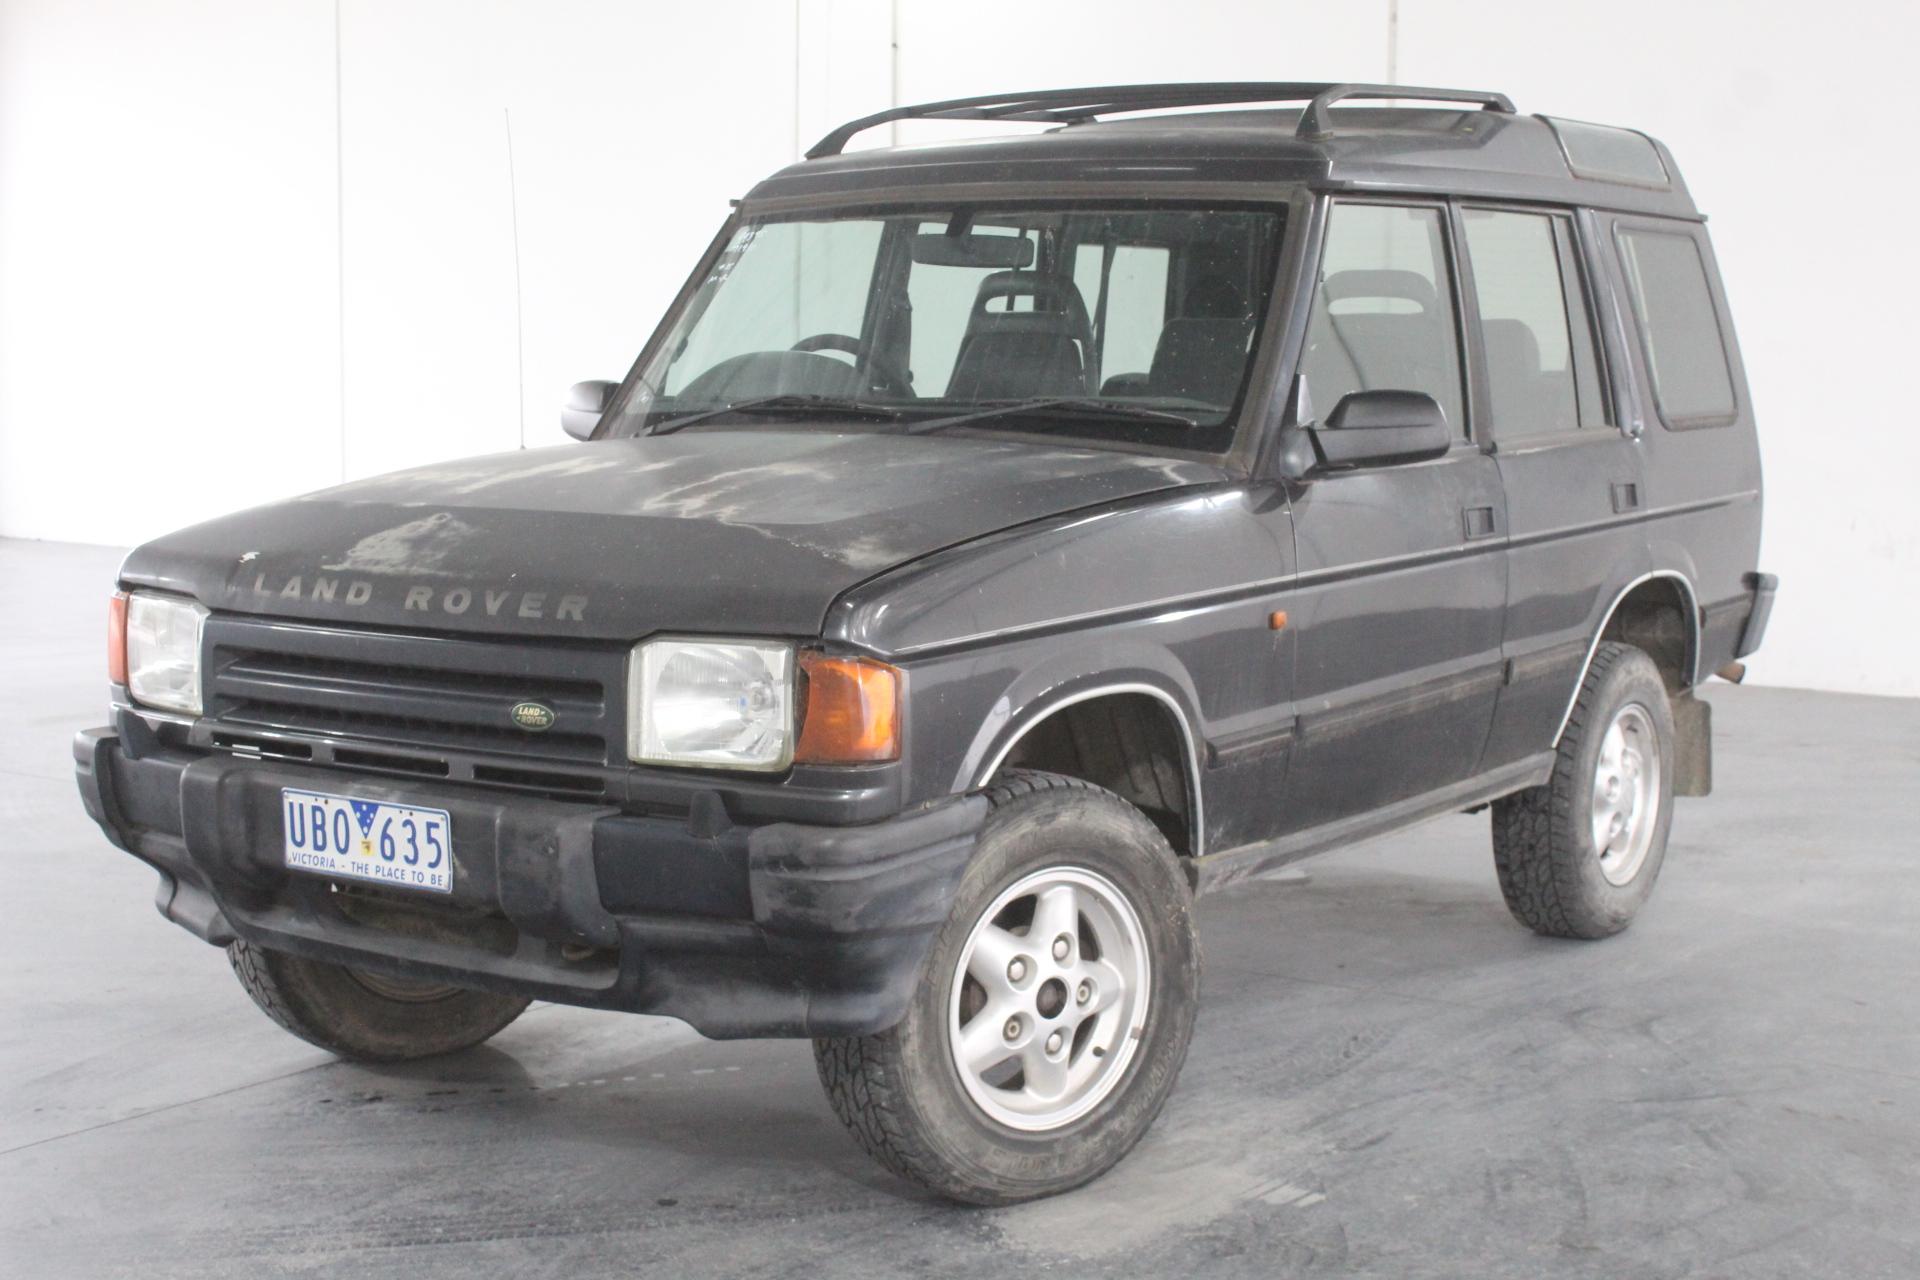 1996 Land Rover Discovery V8i (4x4) Automatic Wagon